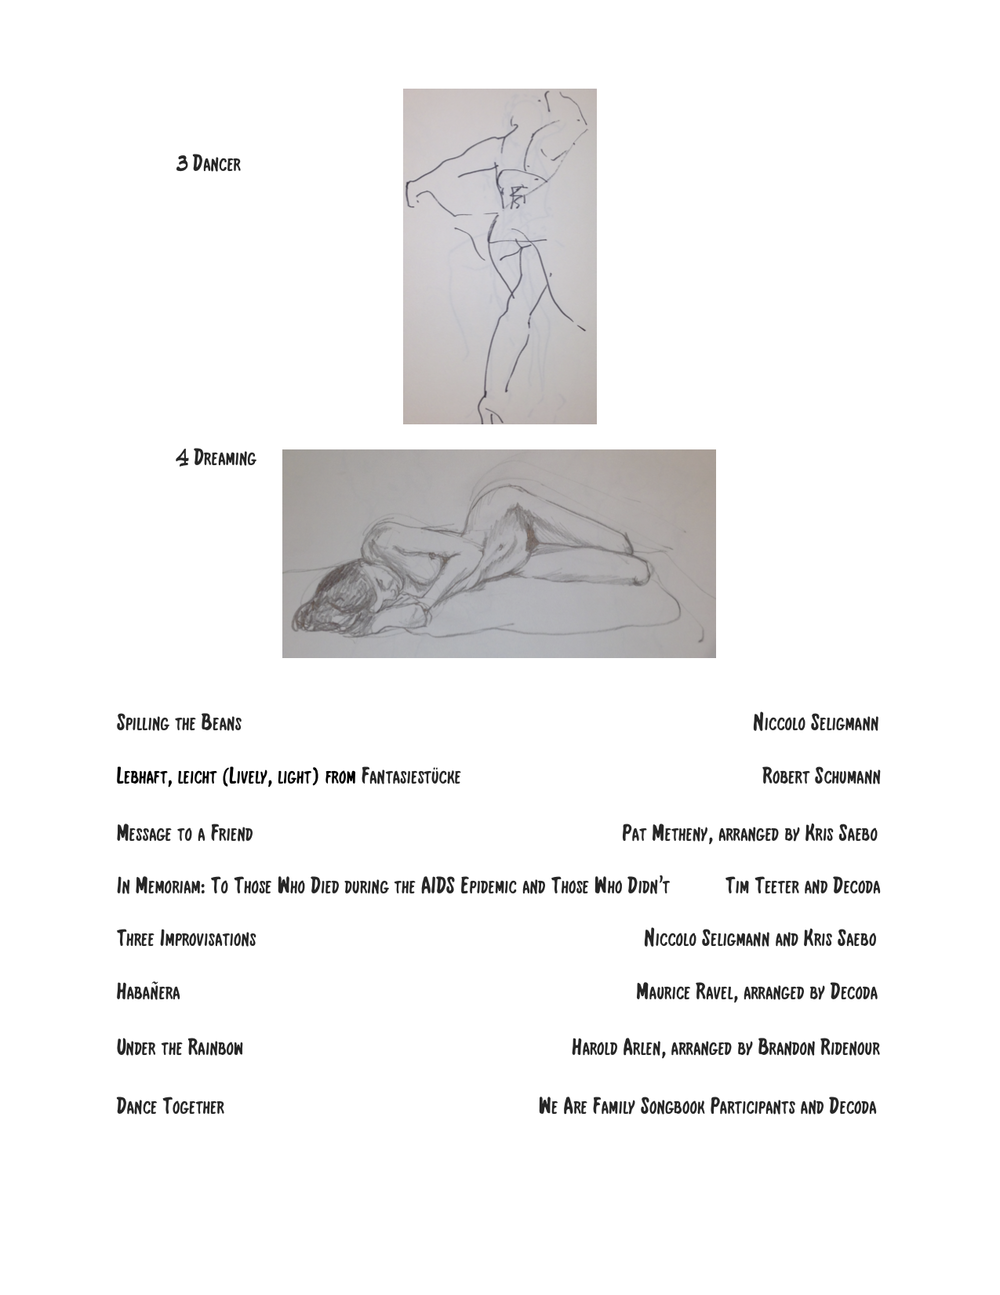 Concert Program, page 3